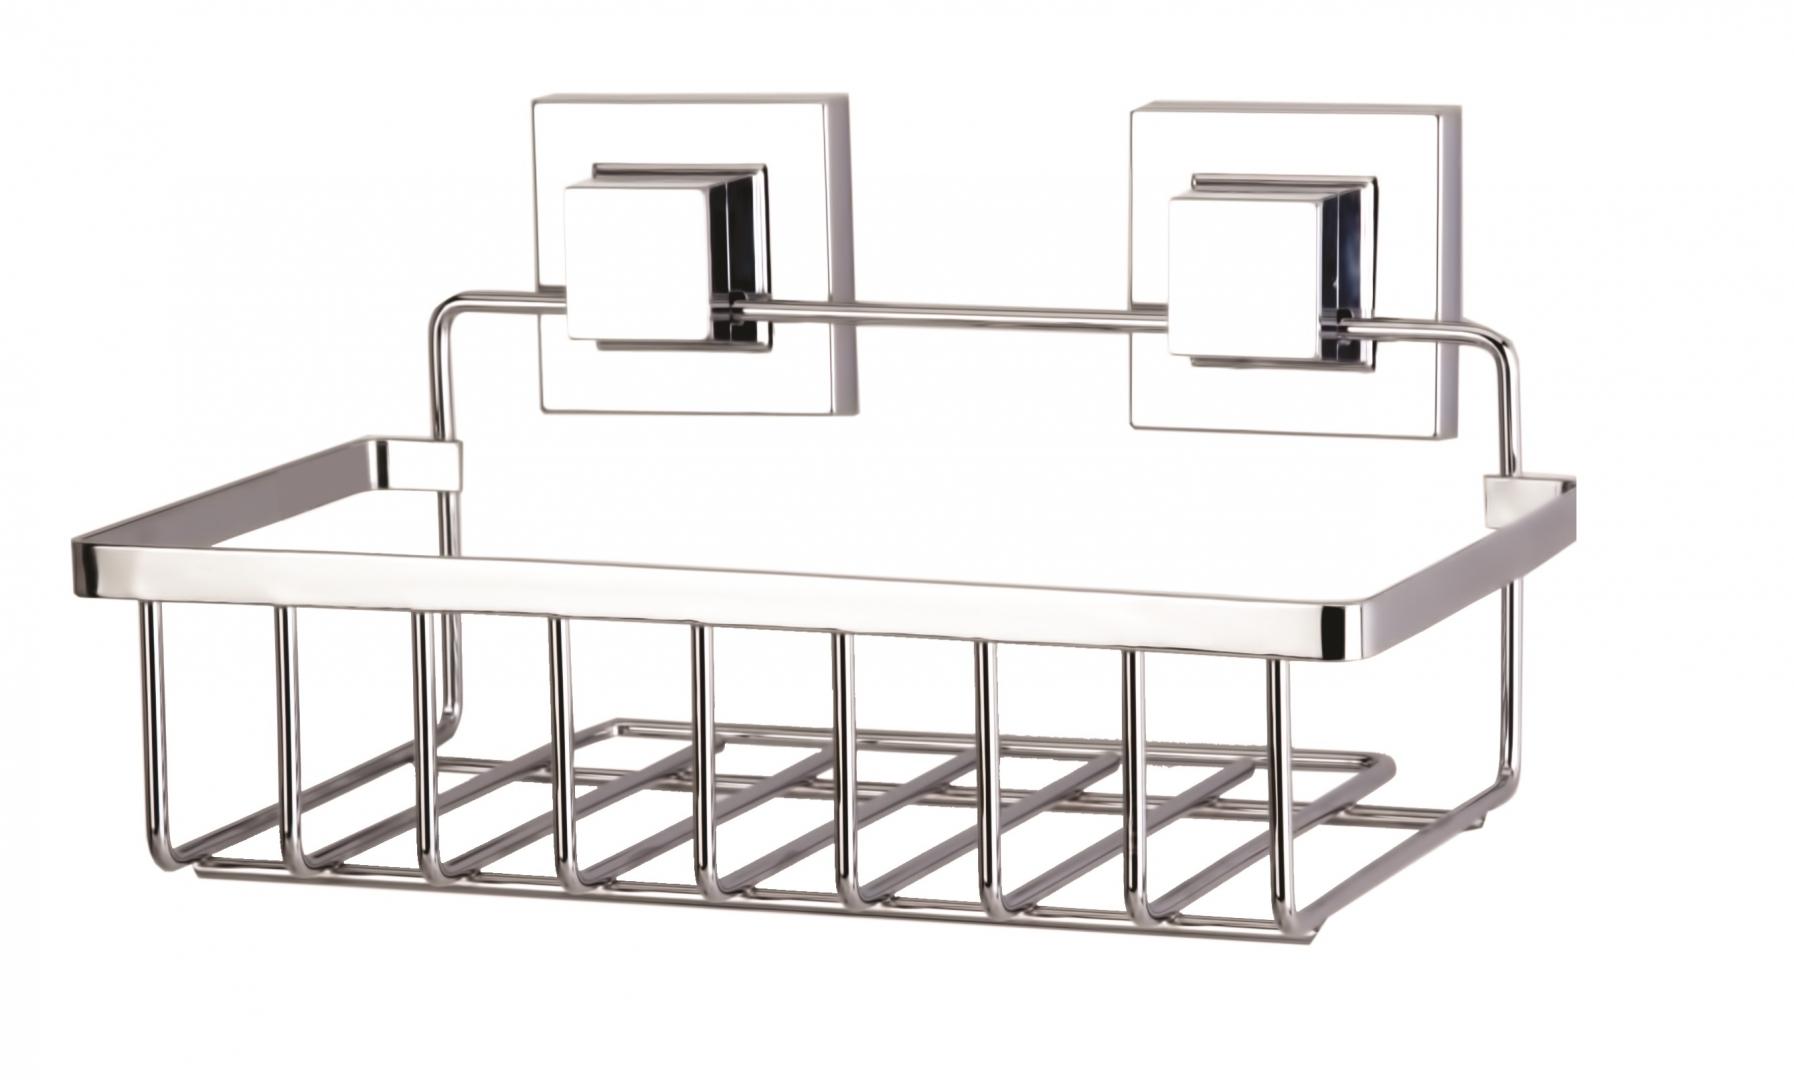 Полка в ванную TEKNO-TEL прямая EF241 1 ярус 24х15х14 самоклеящаяся по цене 1 281